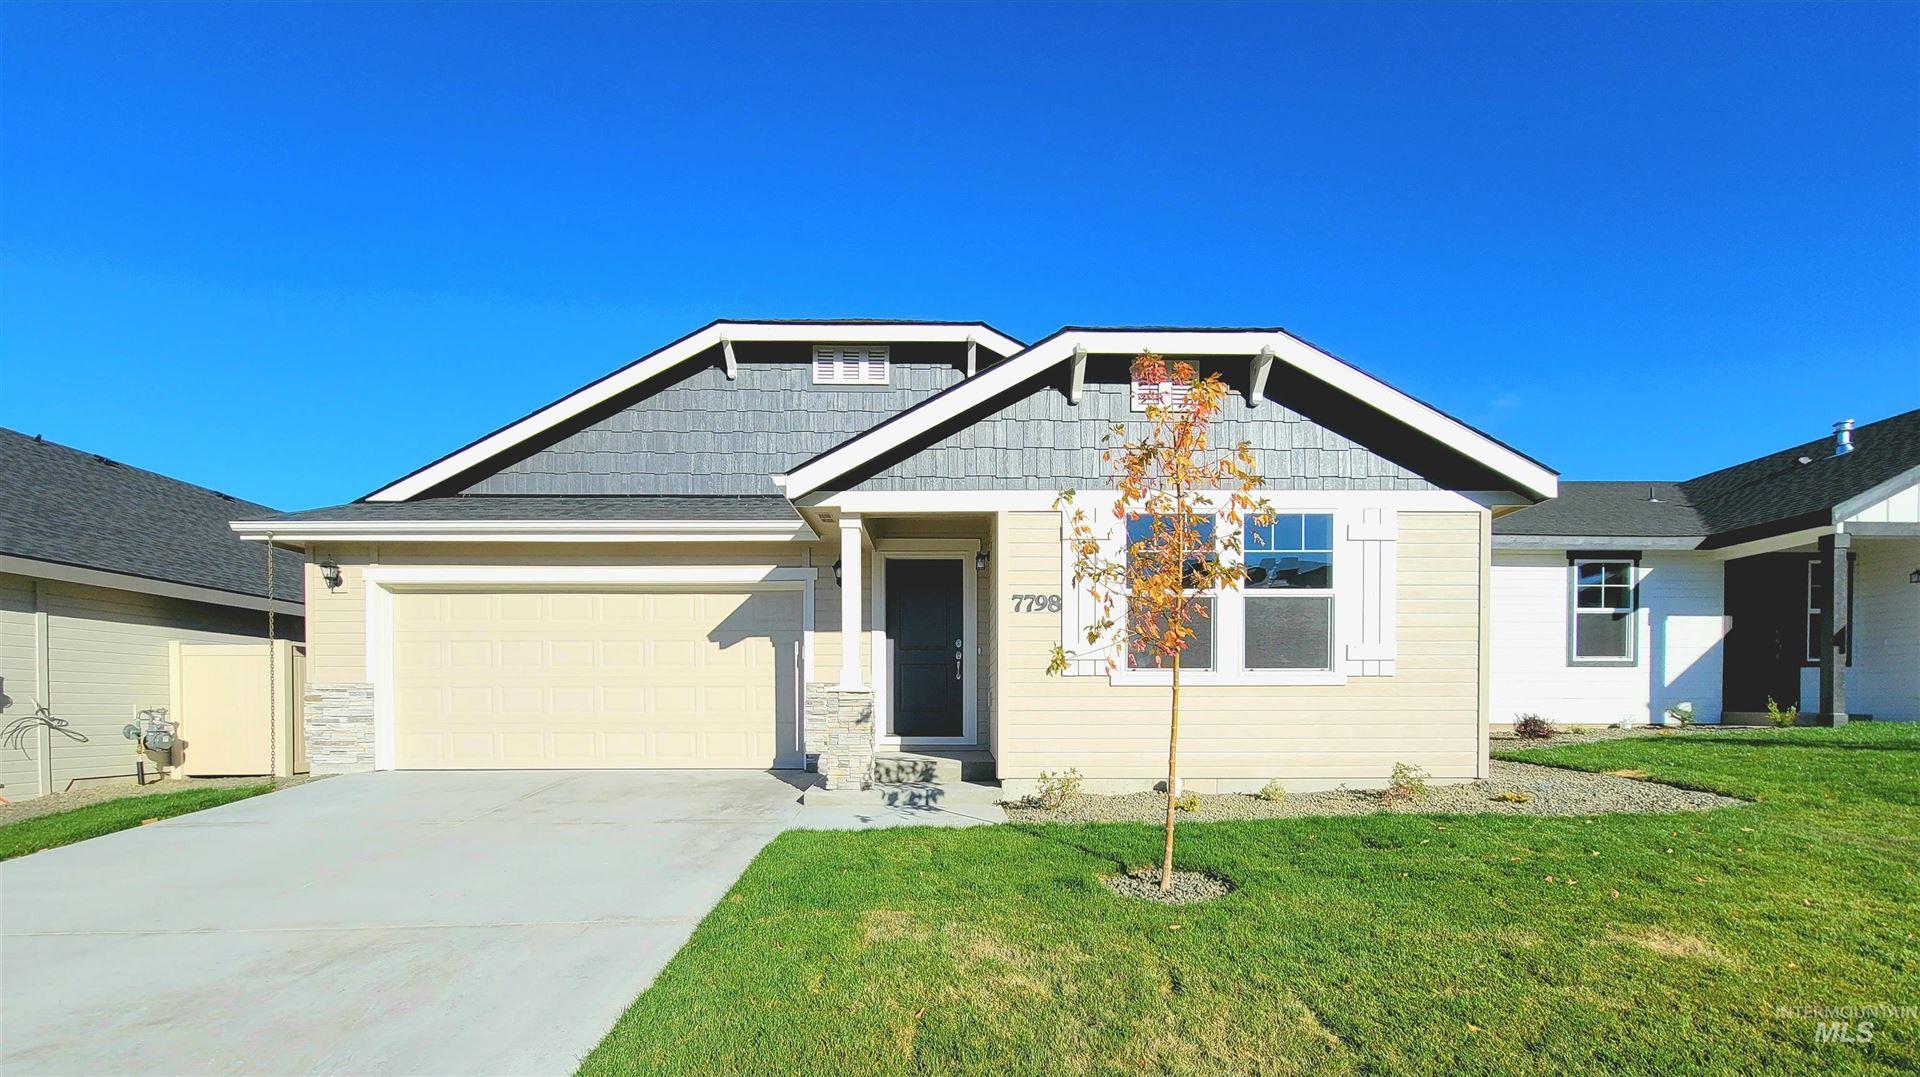 7798 S Boysenberry, Boise, ID 83709 - MLS#: 98812749